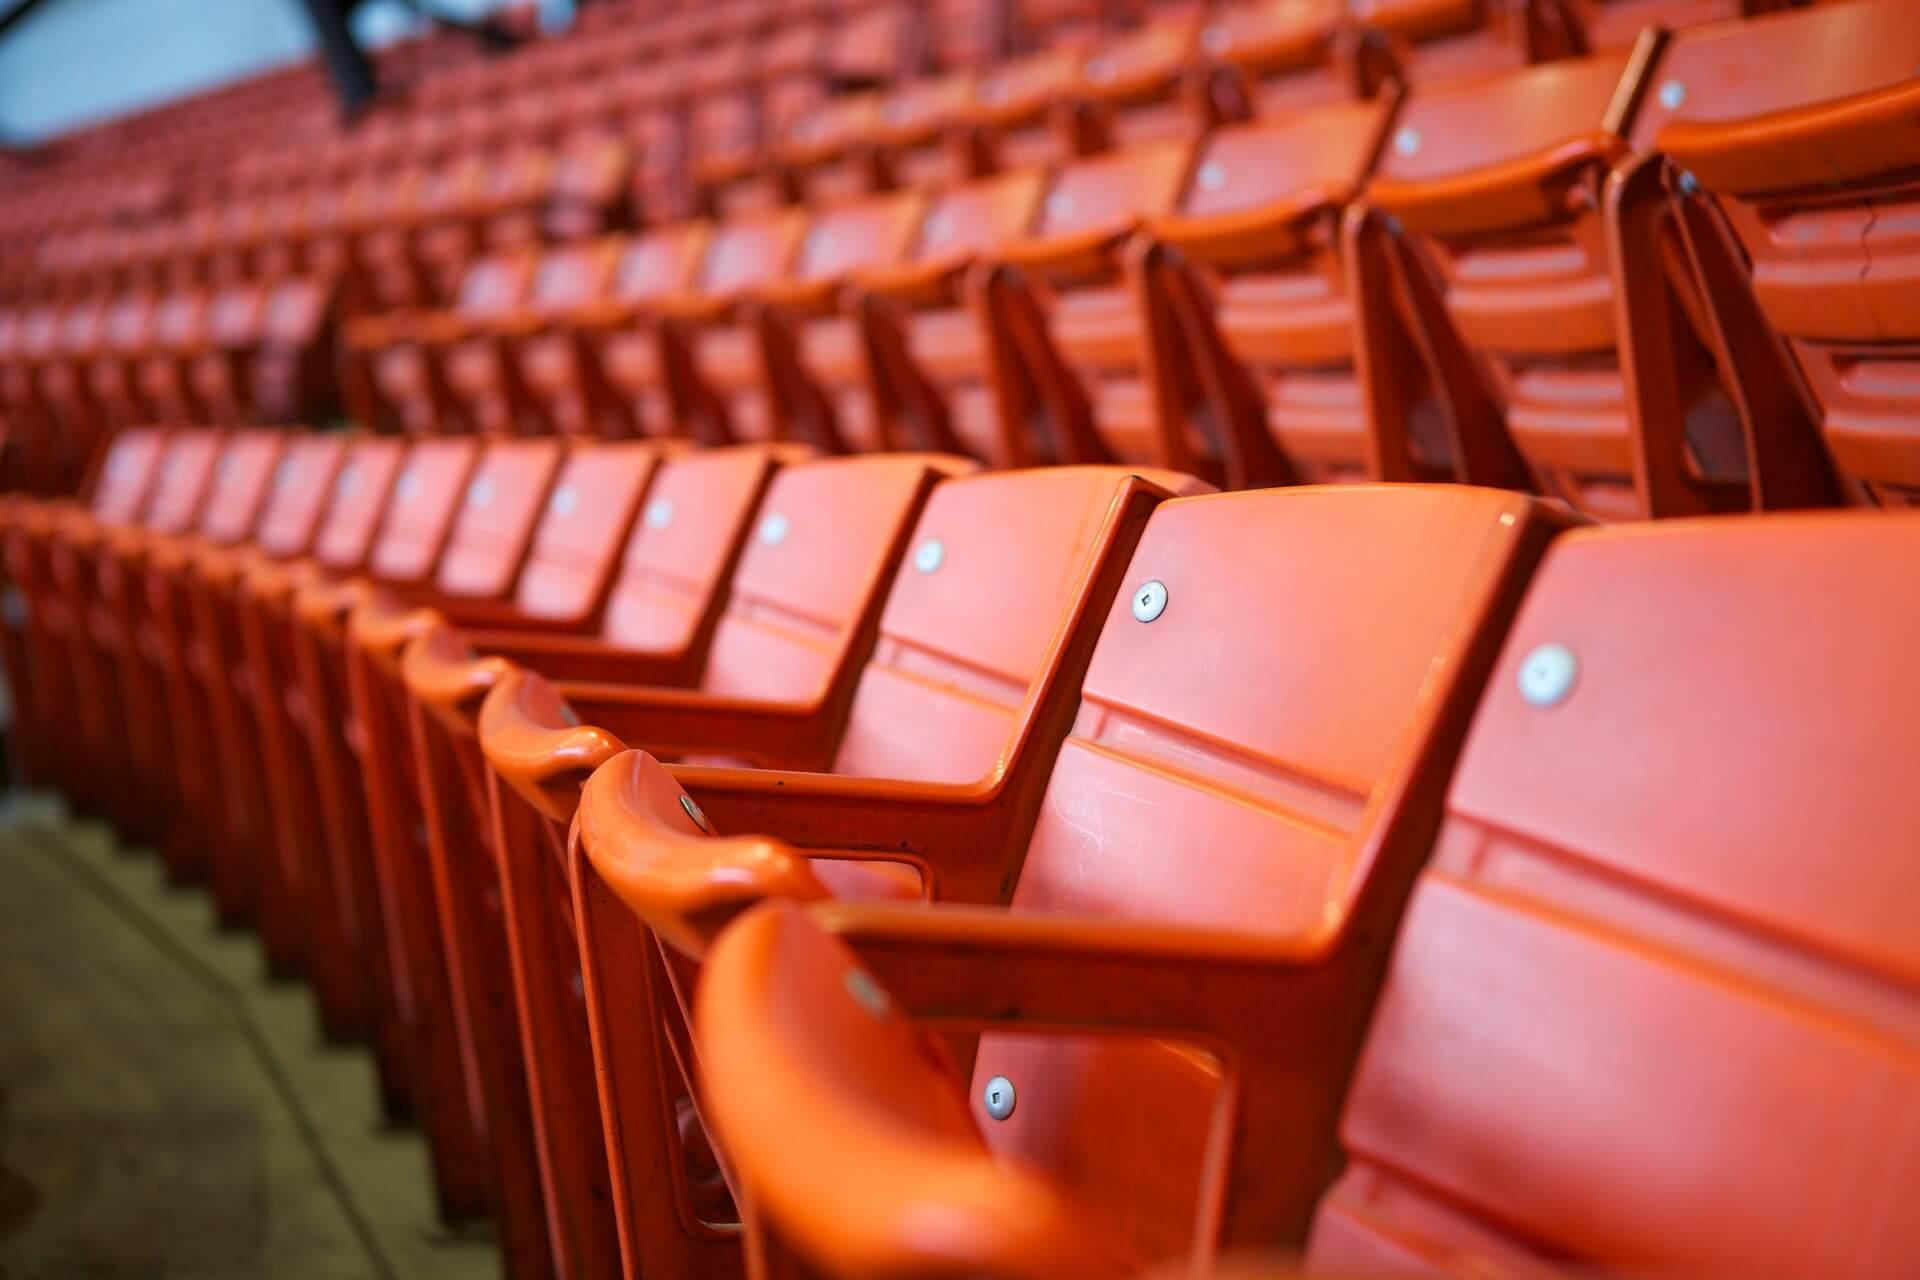 Sportutbildning, Idrottsutbildning, Sportutbildningar, Sports Education, Sportutbildningar 2021, Sports Education 2021, Sports education online, Swedish Sports education